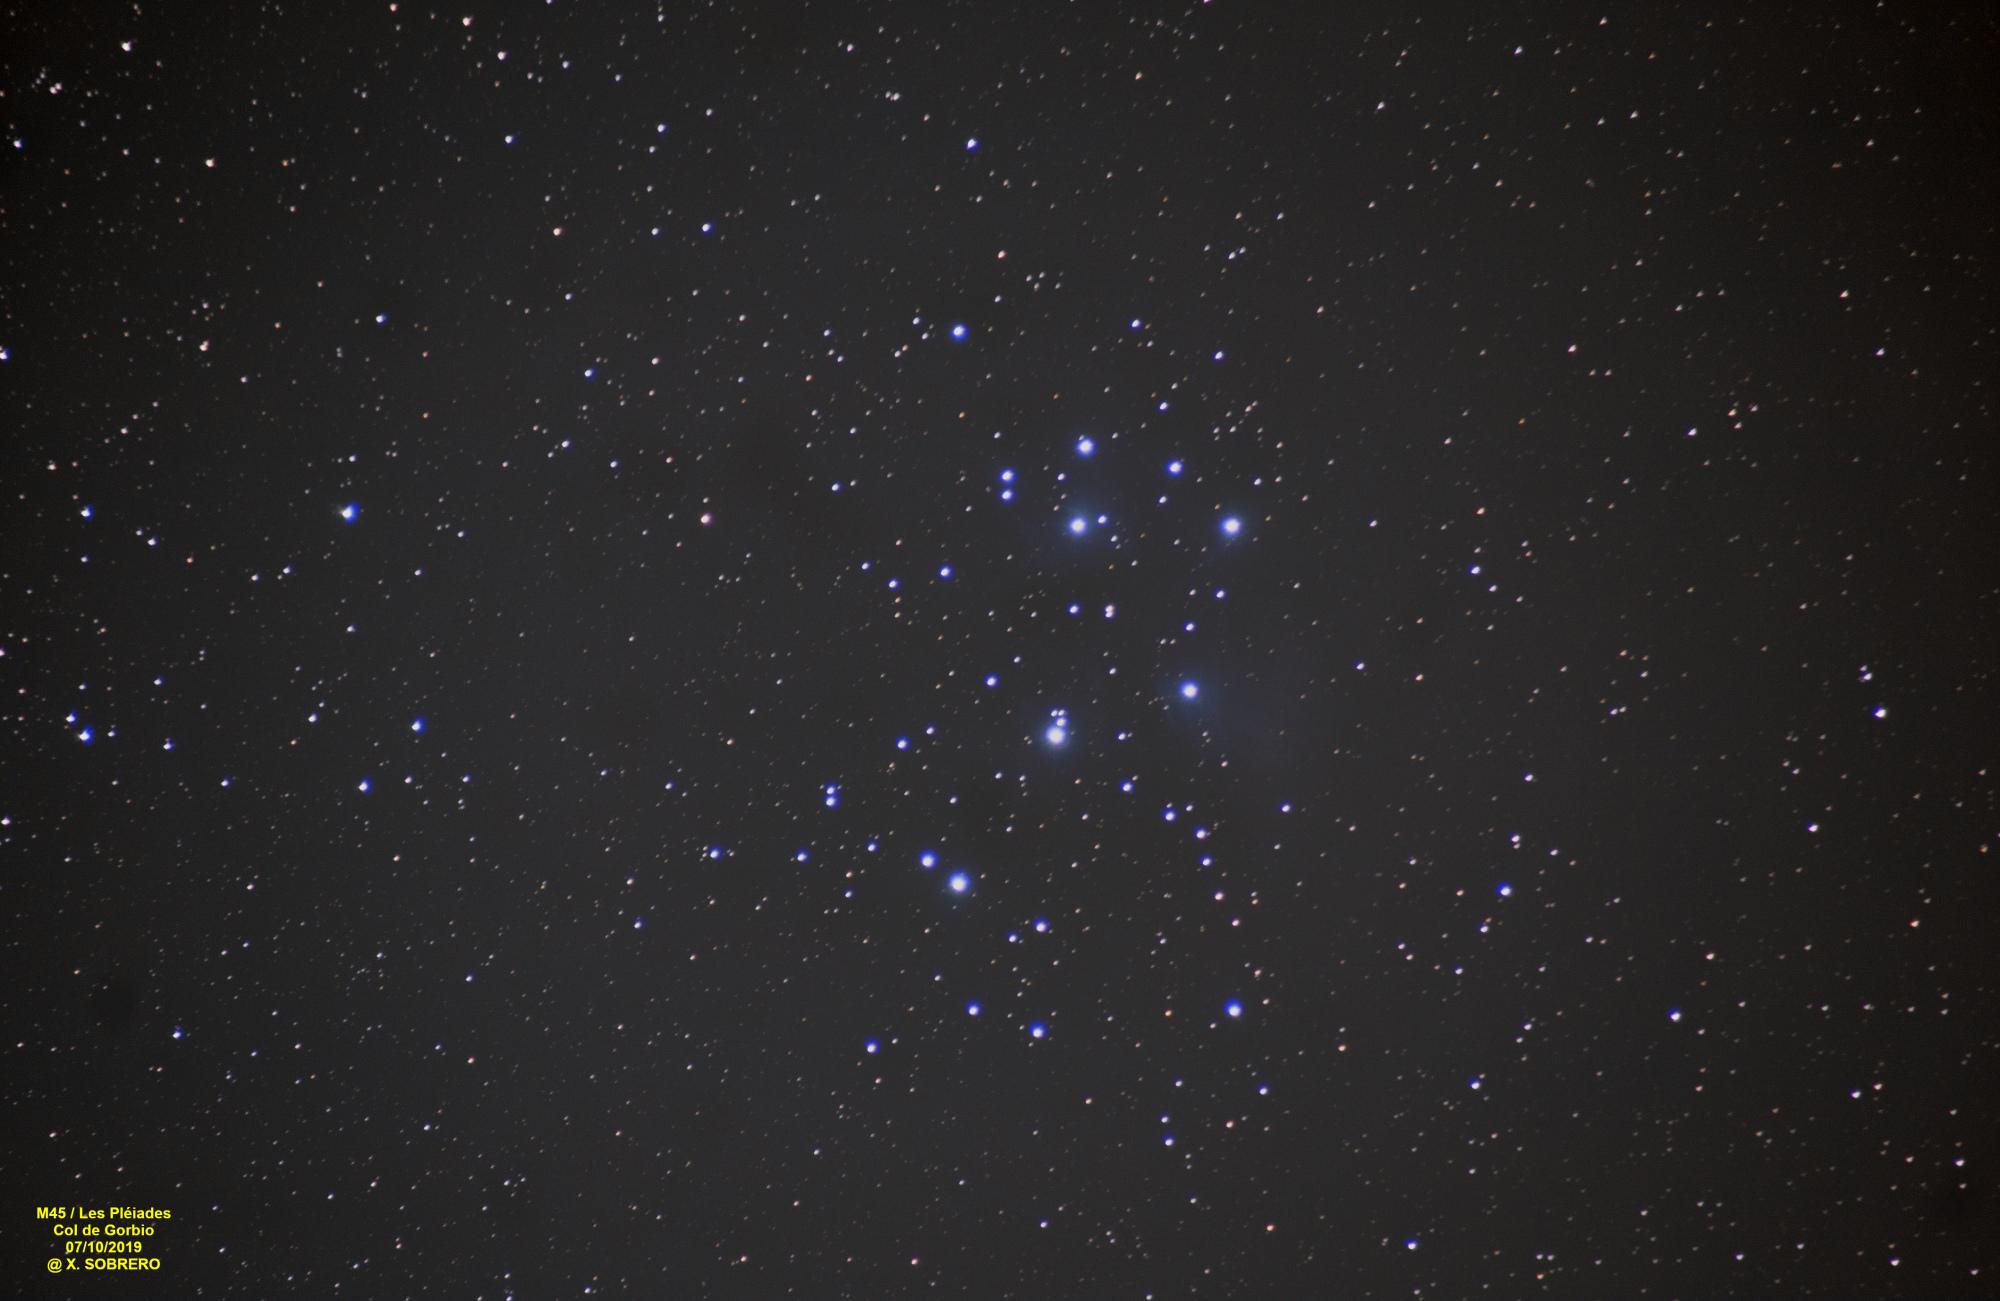 M45_PLEIADES.thumb.jpg.8c9e67c8a4faf30ee9c58dbf24361336.jpg